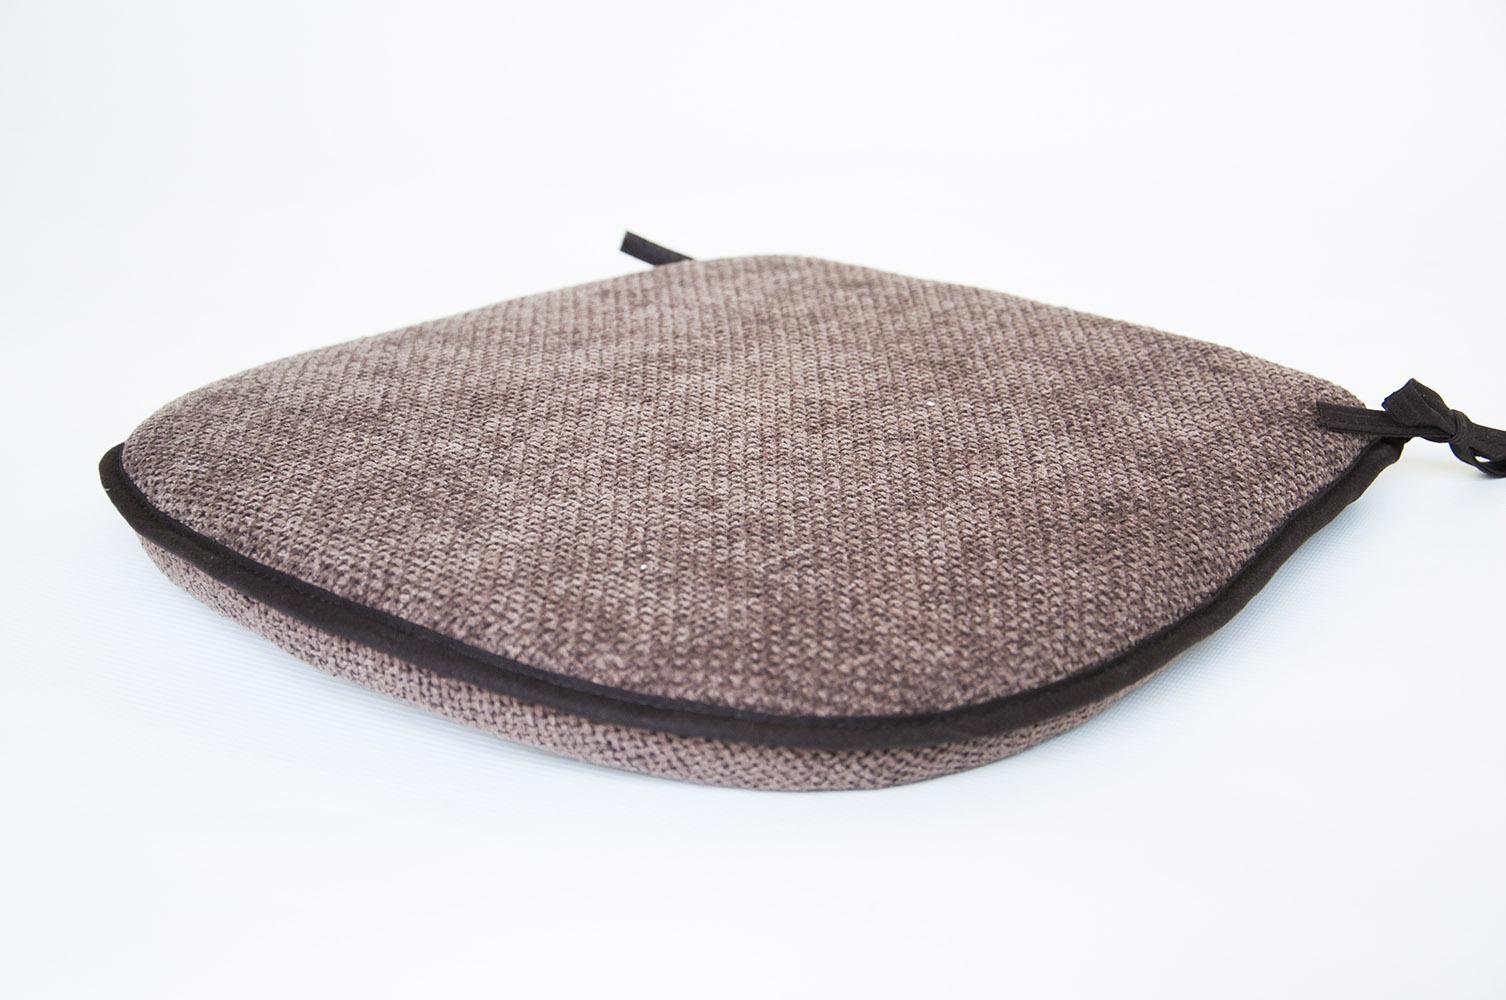 16quot Seat Pad with Ties Lancashire Textiles : chocolatebasketweave from www.lancashiretextiles.co.uk size 1506 x 1000 jpeg 227kB